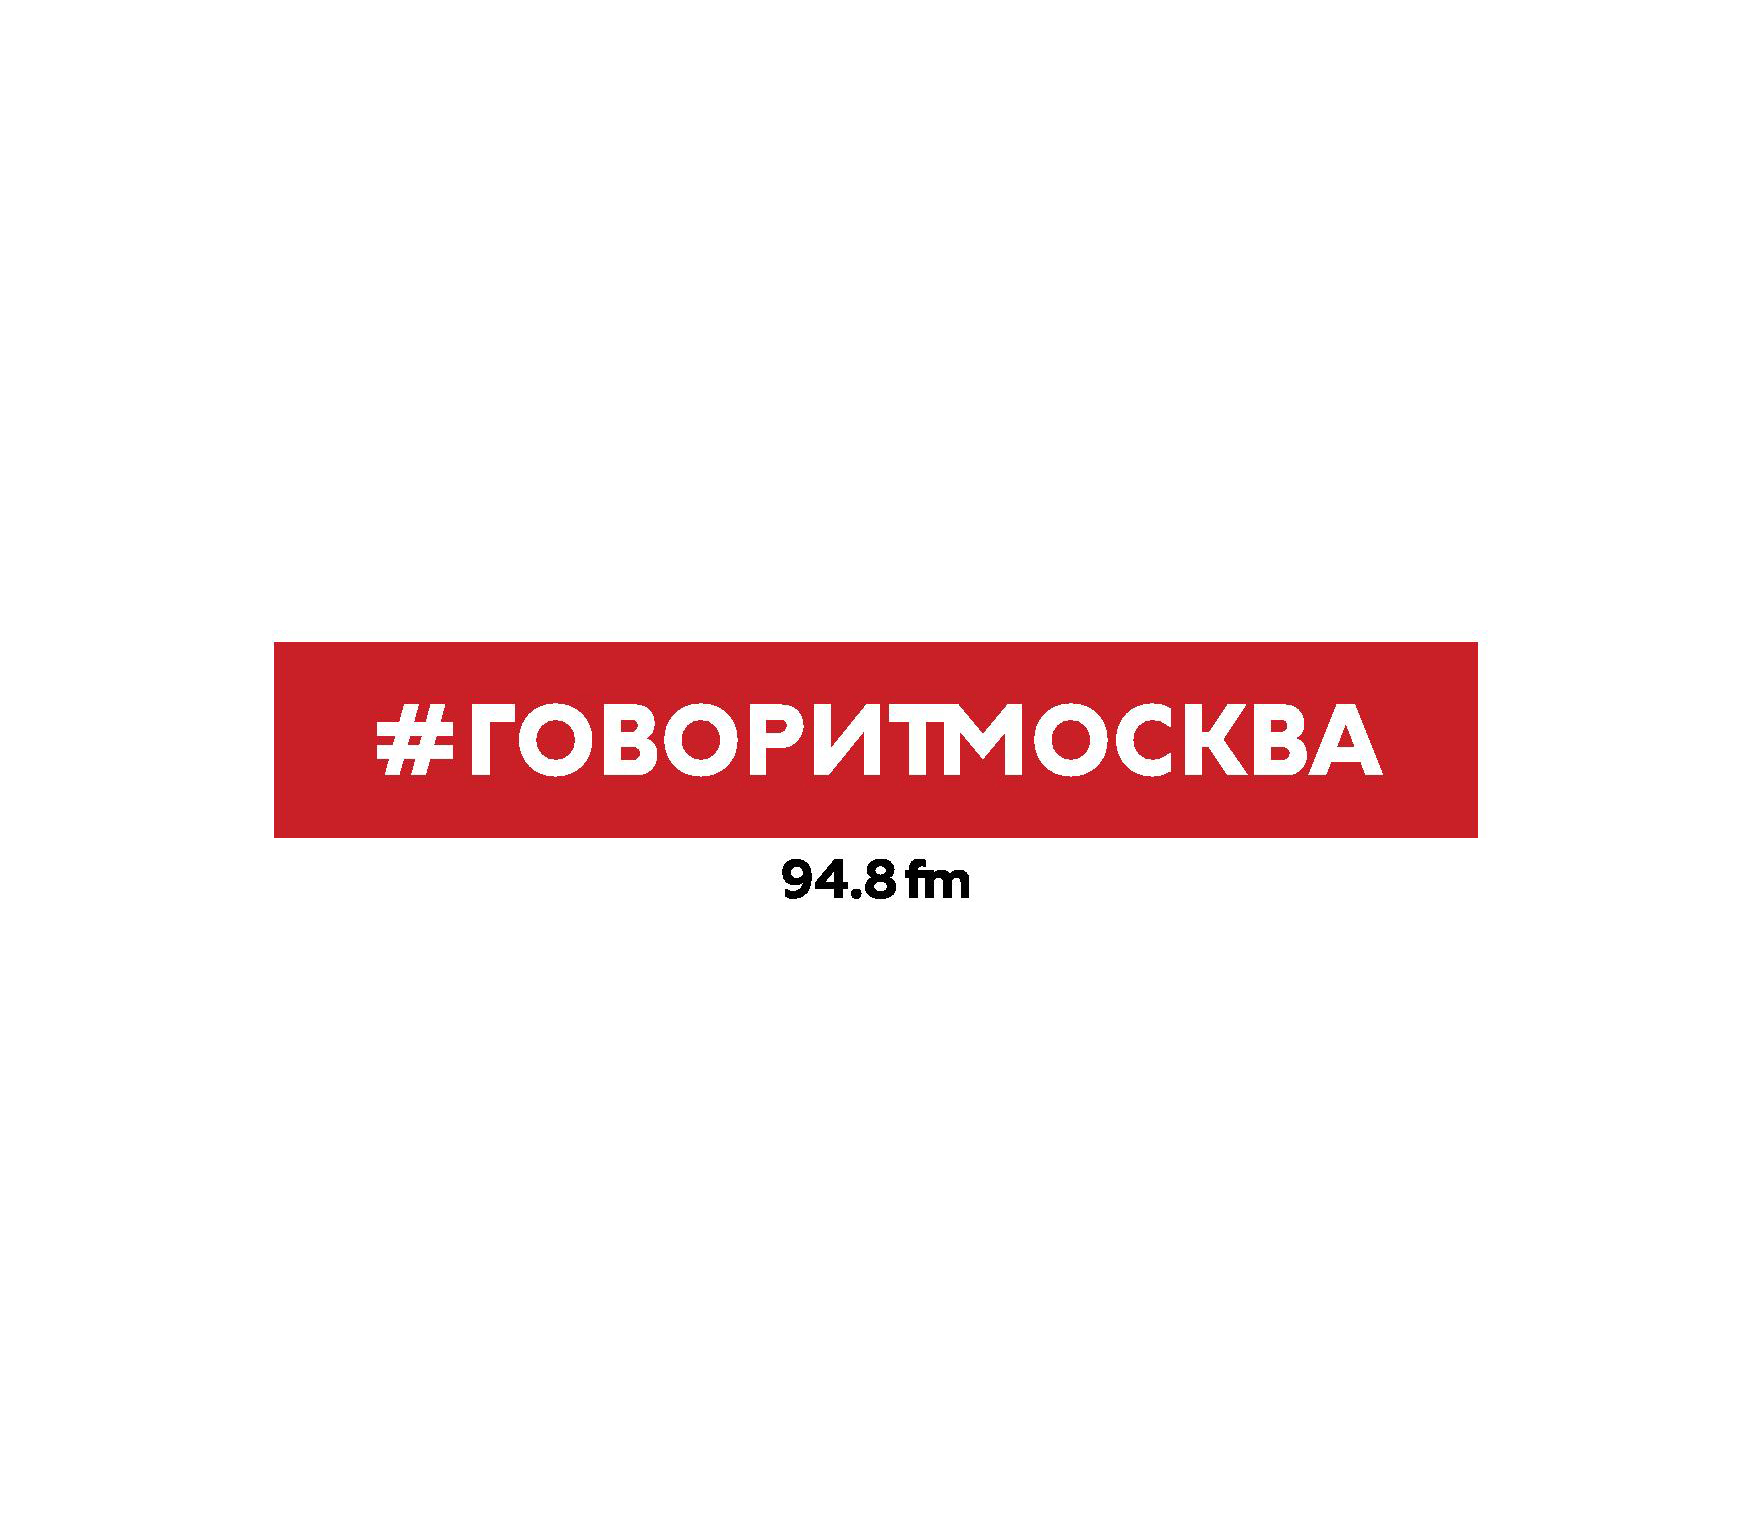 Юрий Никифоров Василий Чапаев никифоров волгин василий акимович серебряная метель